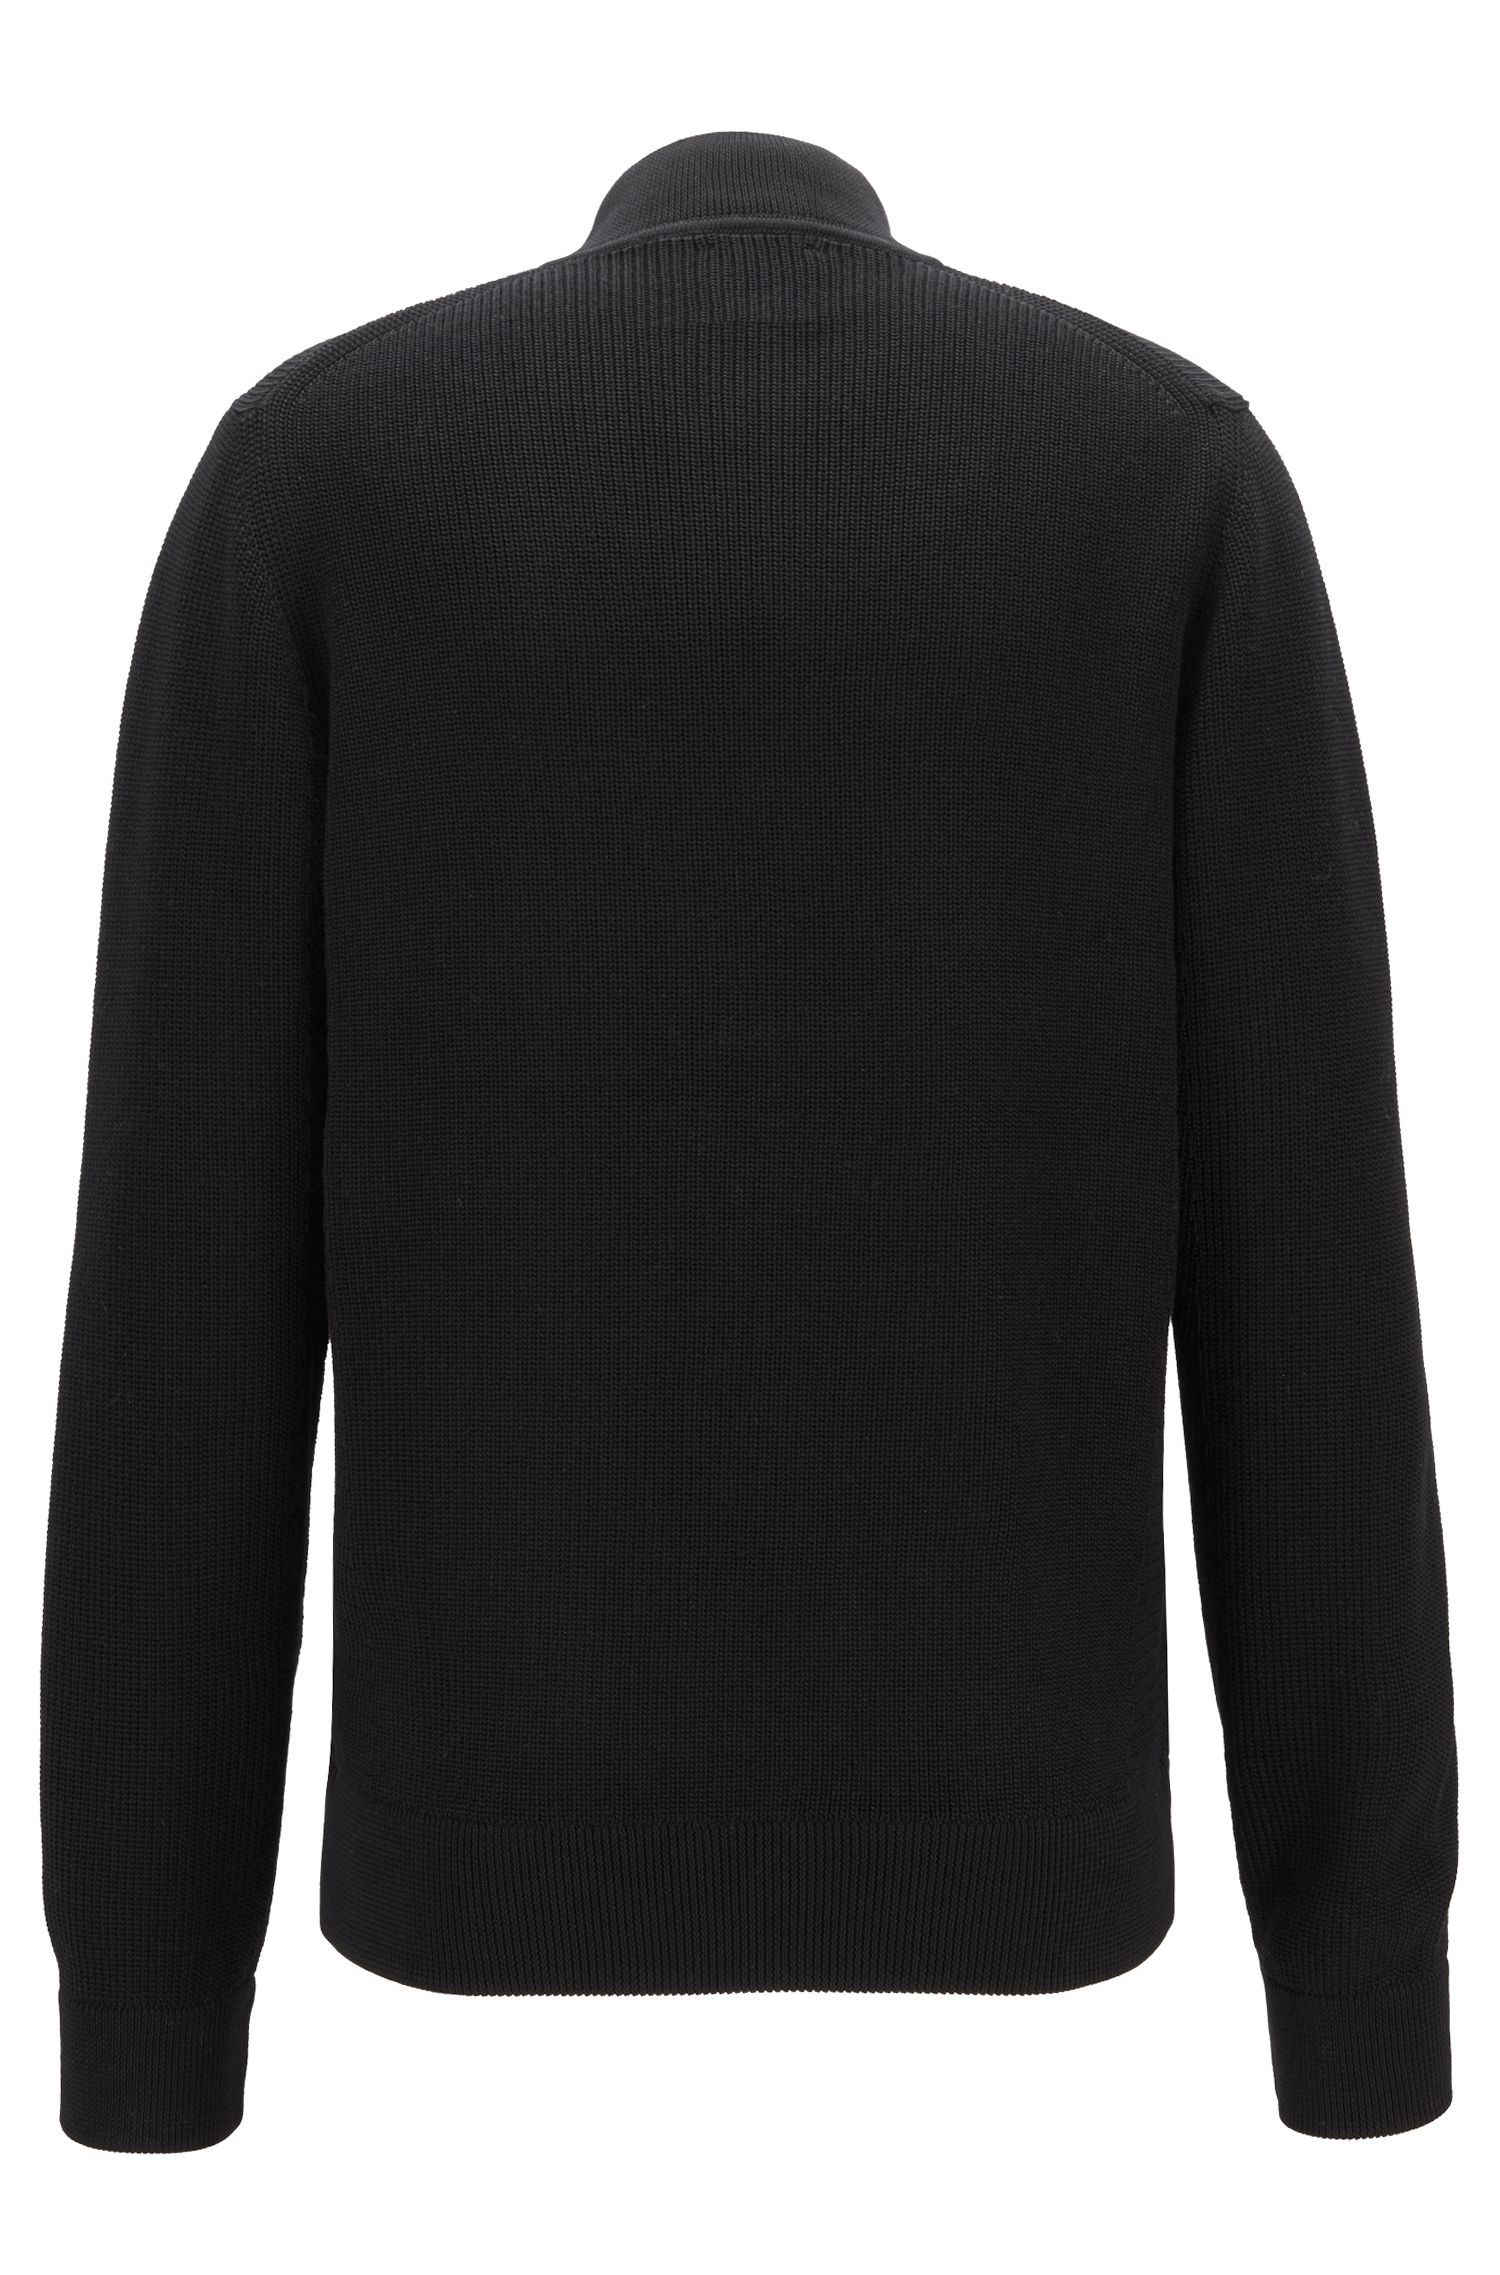 Knitted jacket in mercerized cotton, Black